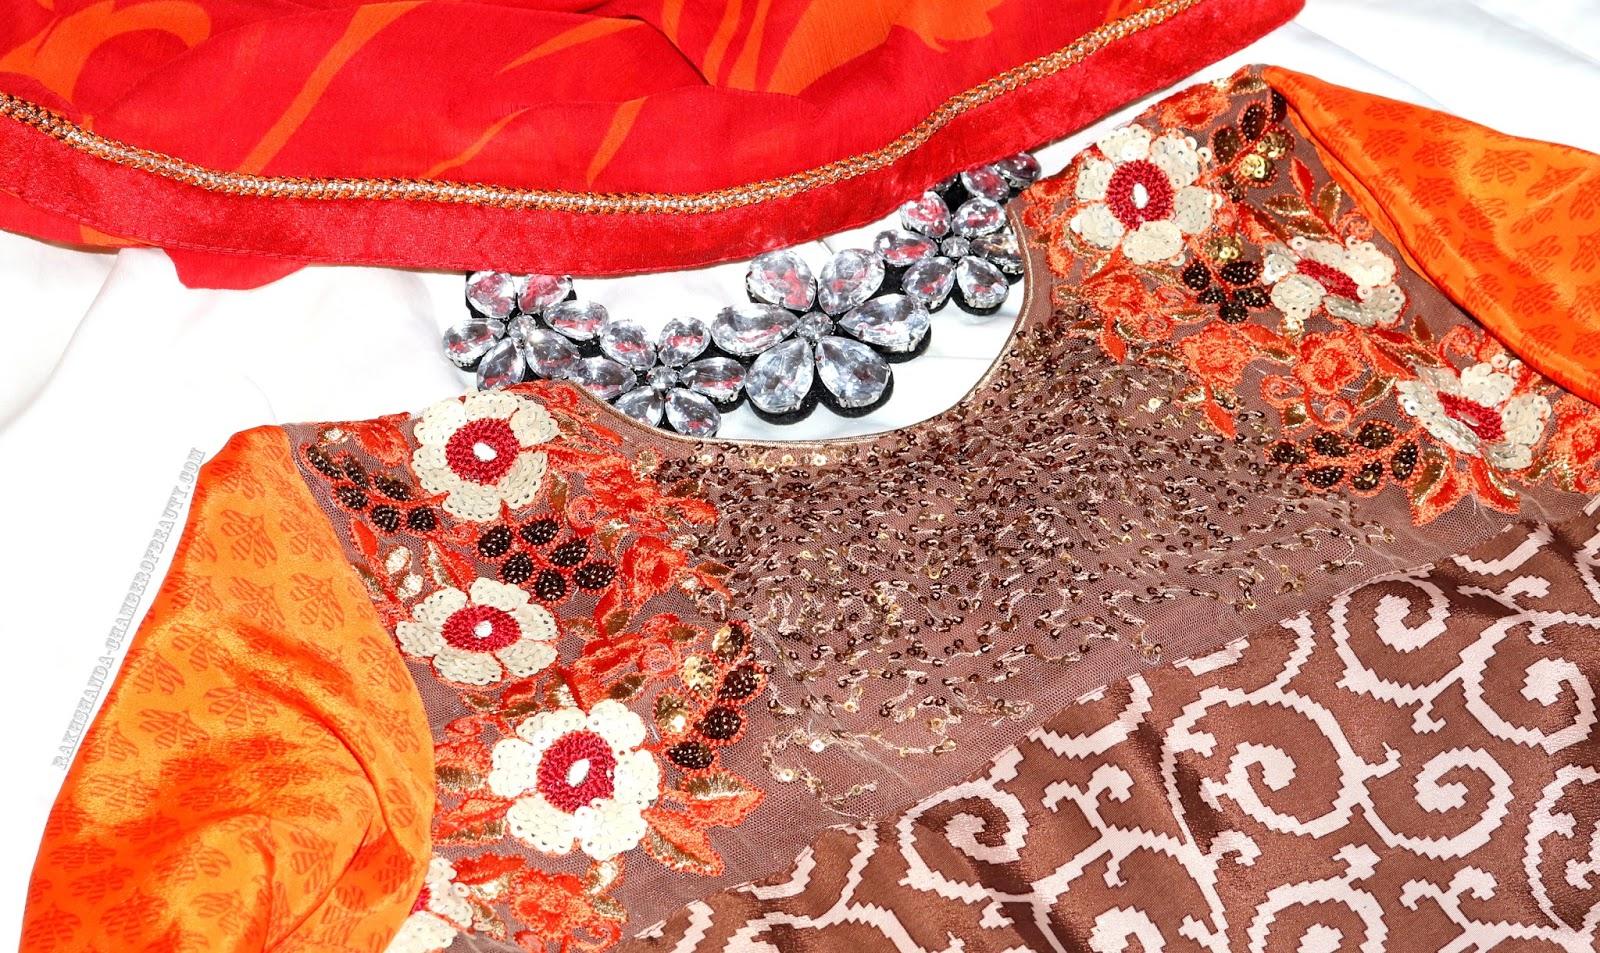 Chamber of beauty blog, BLOGGER, Fashion blogger, Fashion, Indian fashion blogger, ONLINESHOPPING